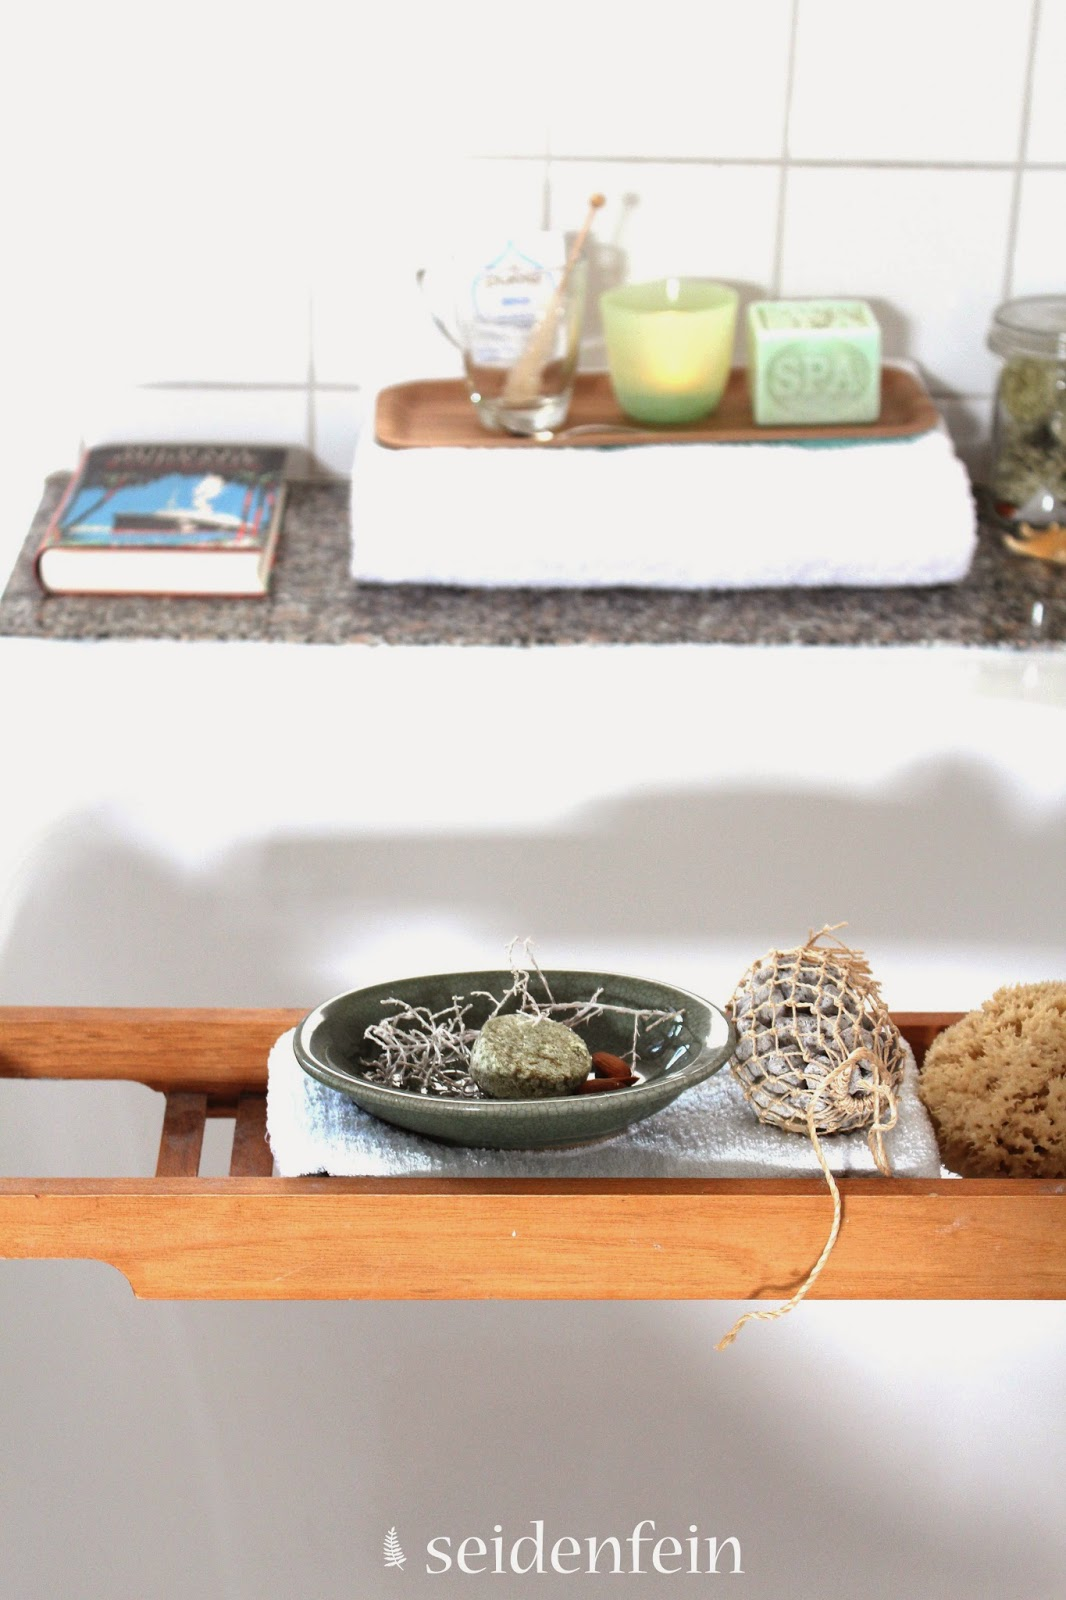 seidenfeins blog vom sch nen landleben gr ntee badetabletten f r den detox day diy. Black Bedroom Furniture Sets. Home Design Ideas